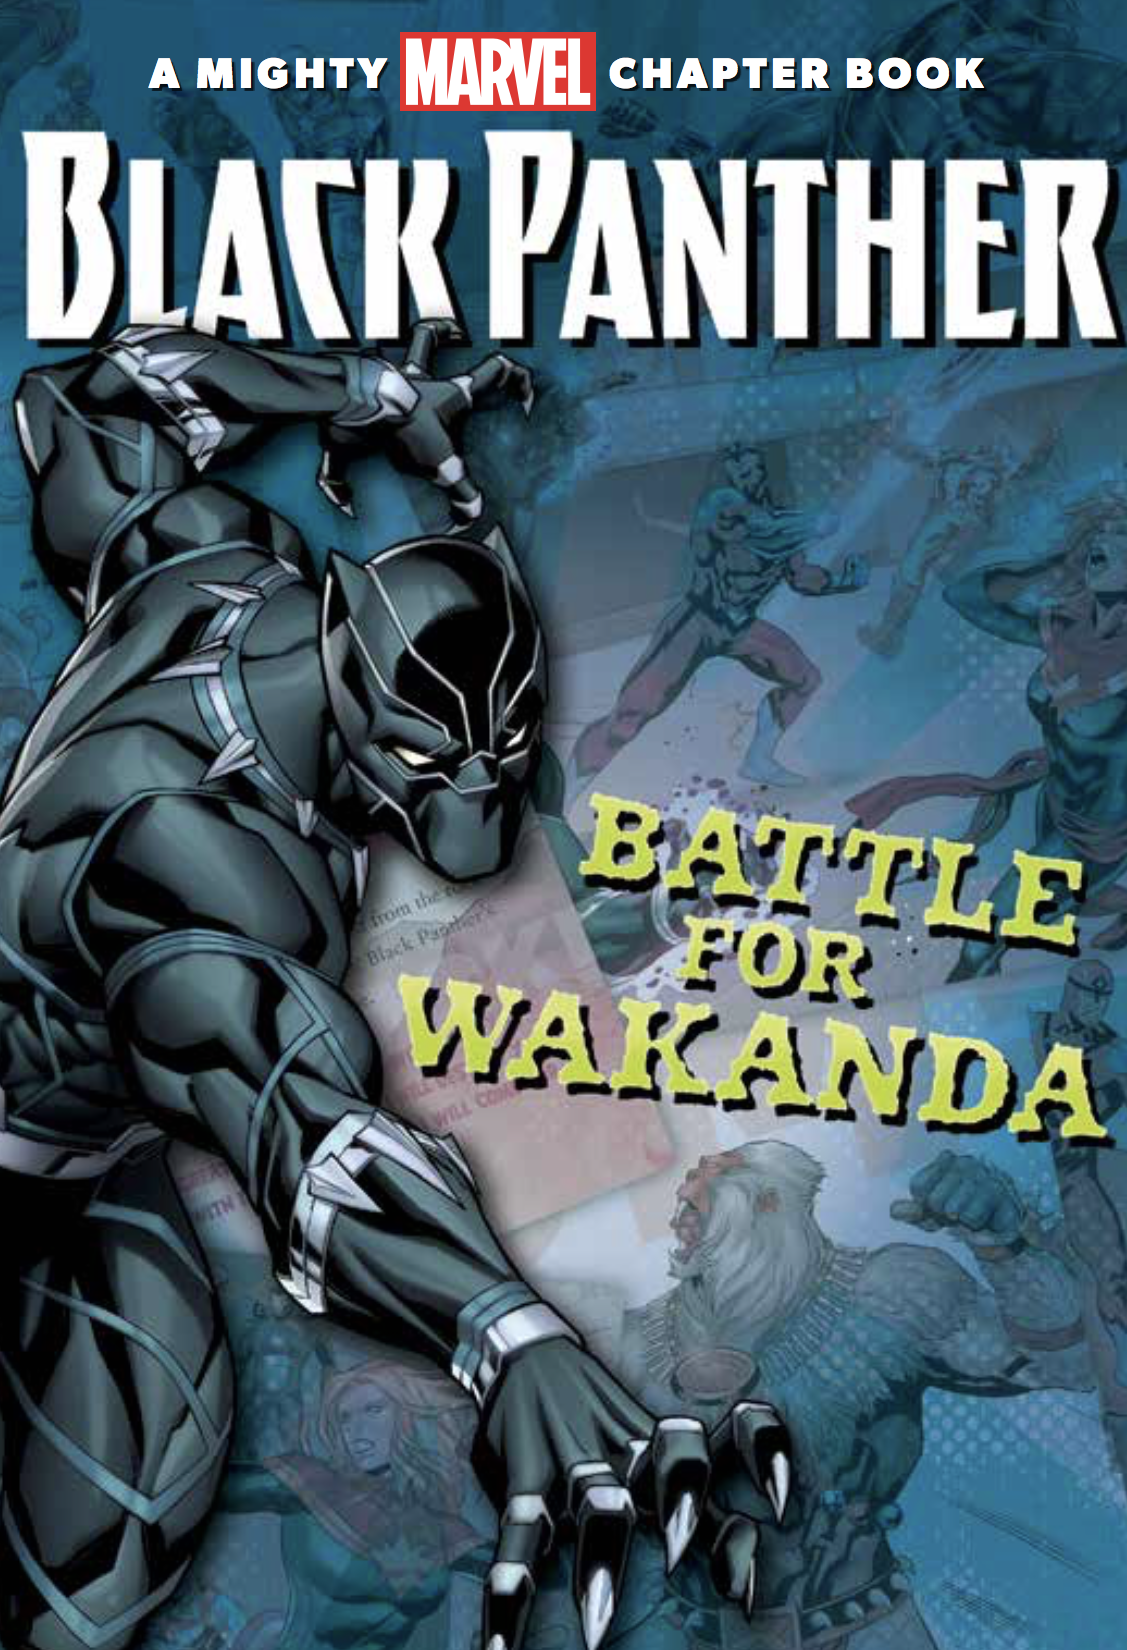 Black Panther: Battle for Wakanda